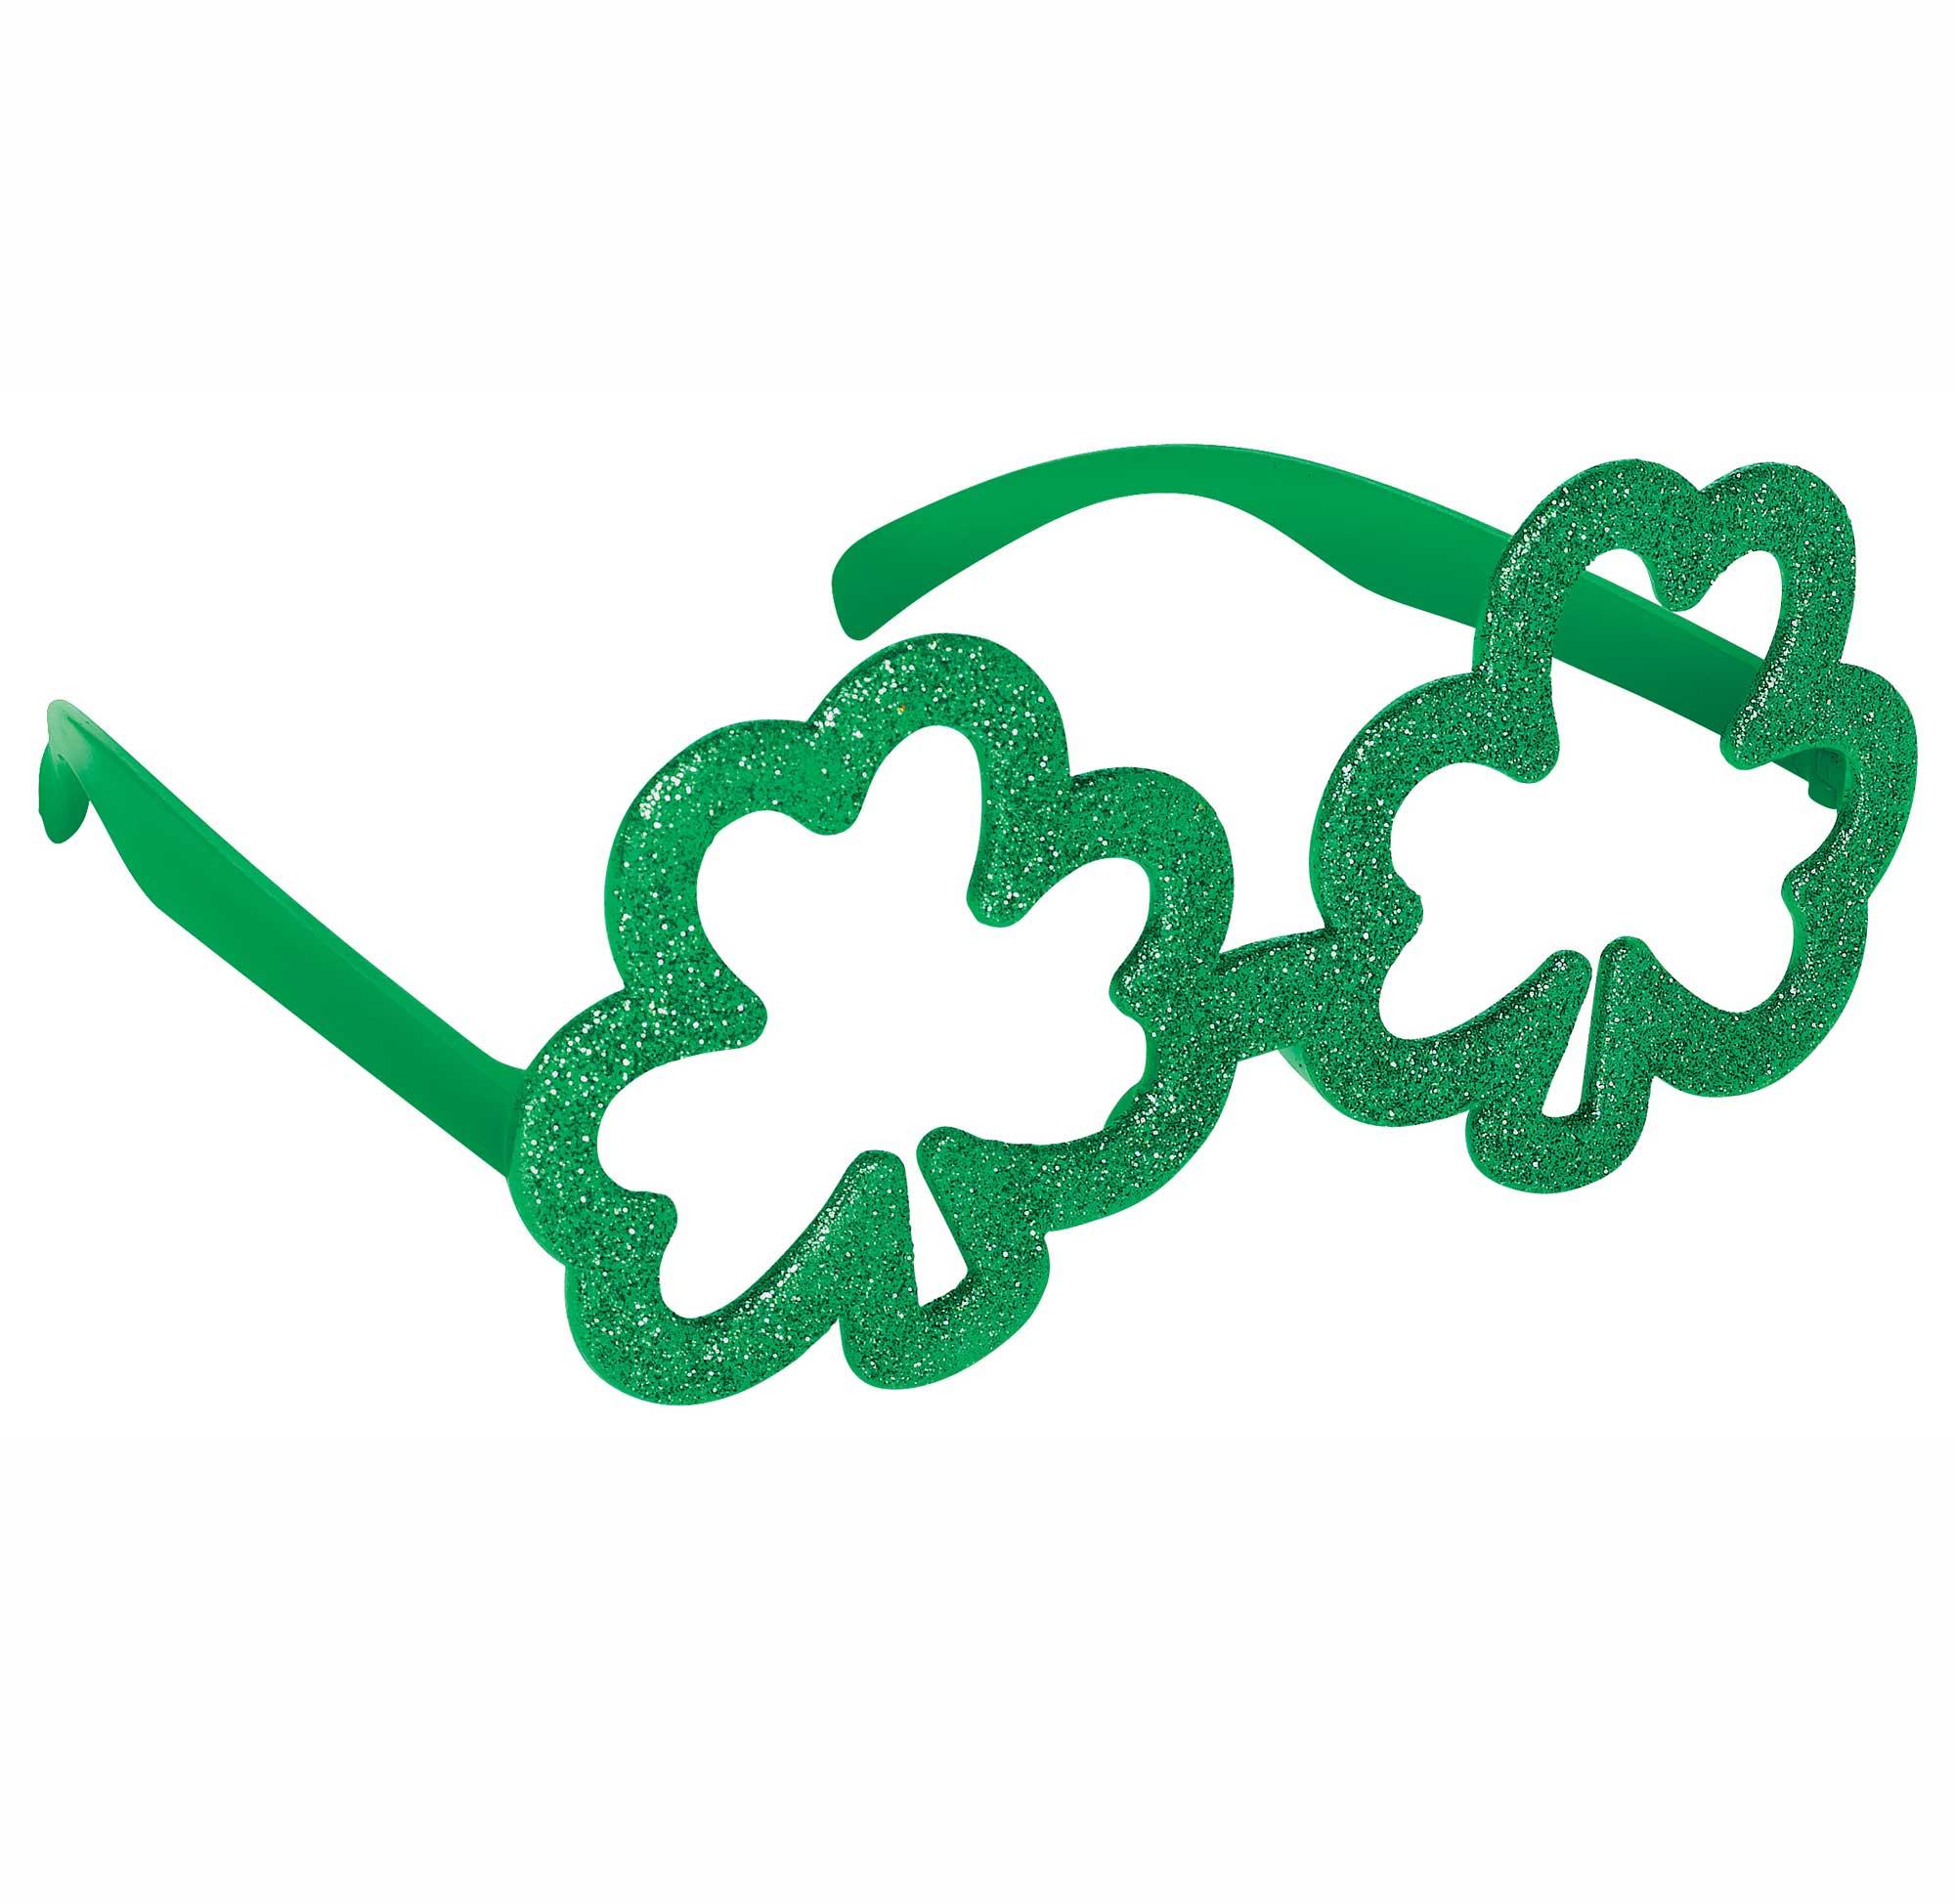 St Patrick's Day Shamrock Shaped Glittered Glasses